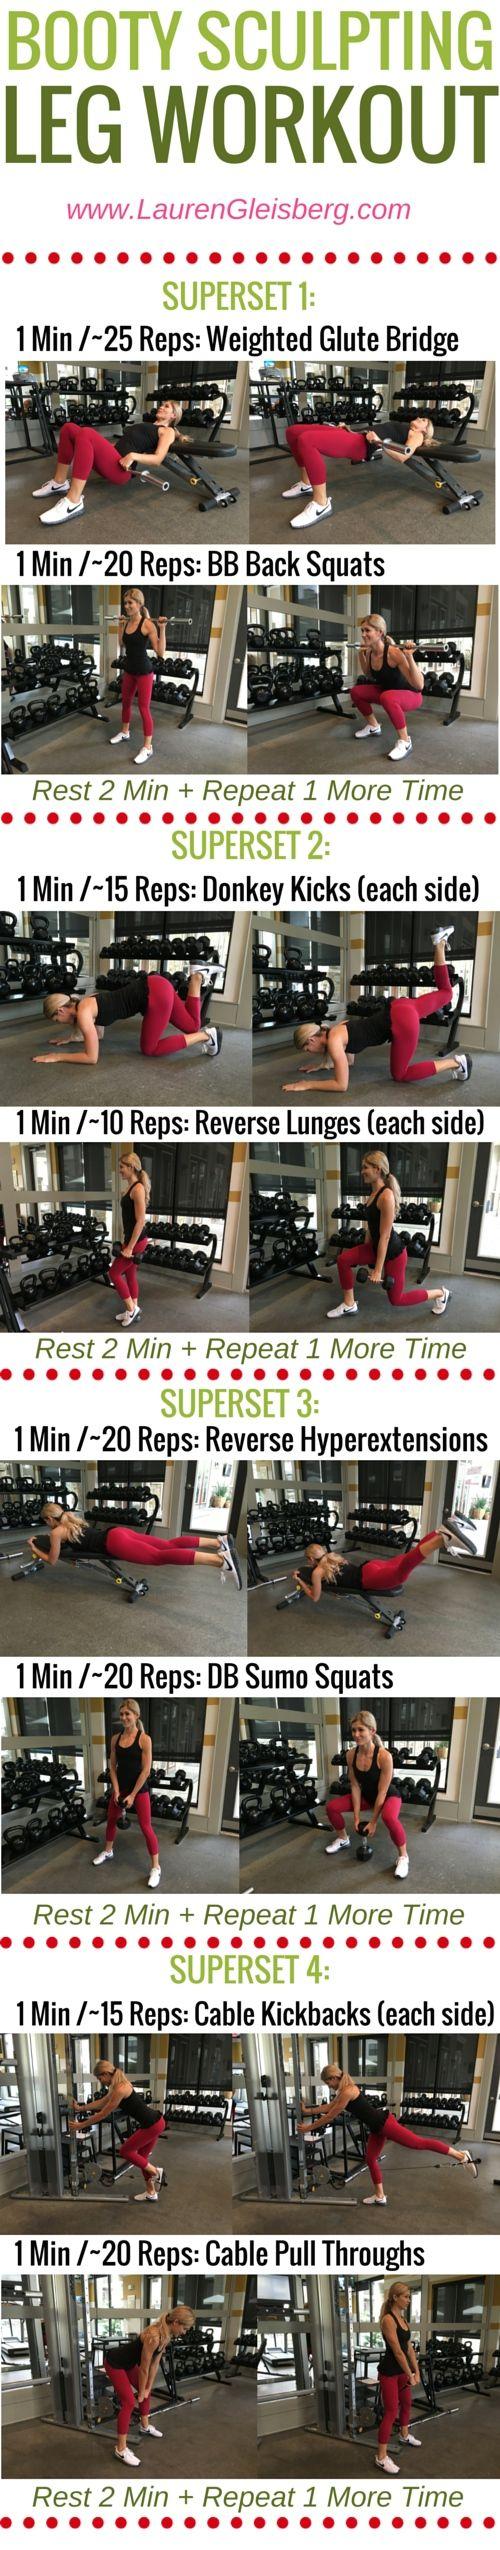 Week 2 Day 2... Legs... Gym version. Lauren Gleisberg